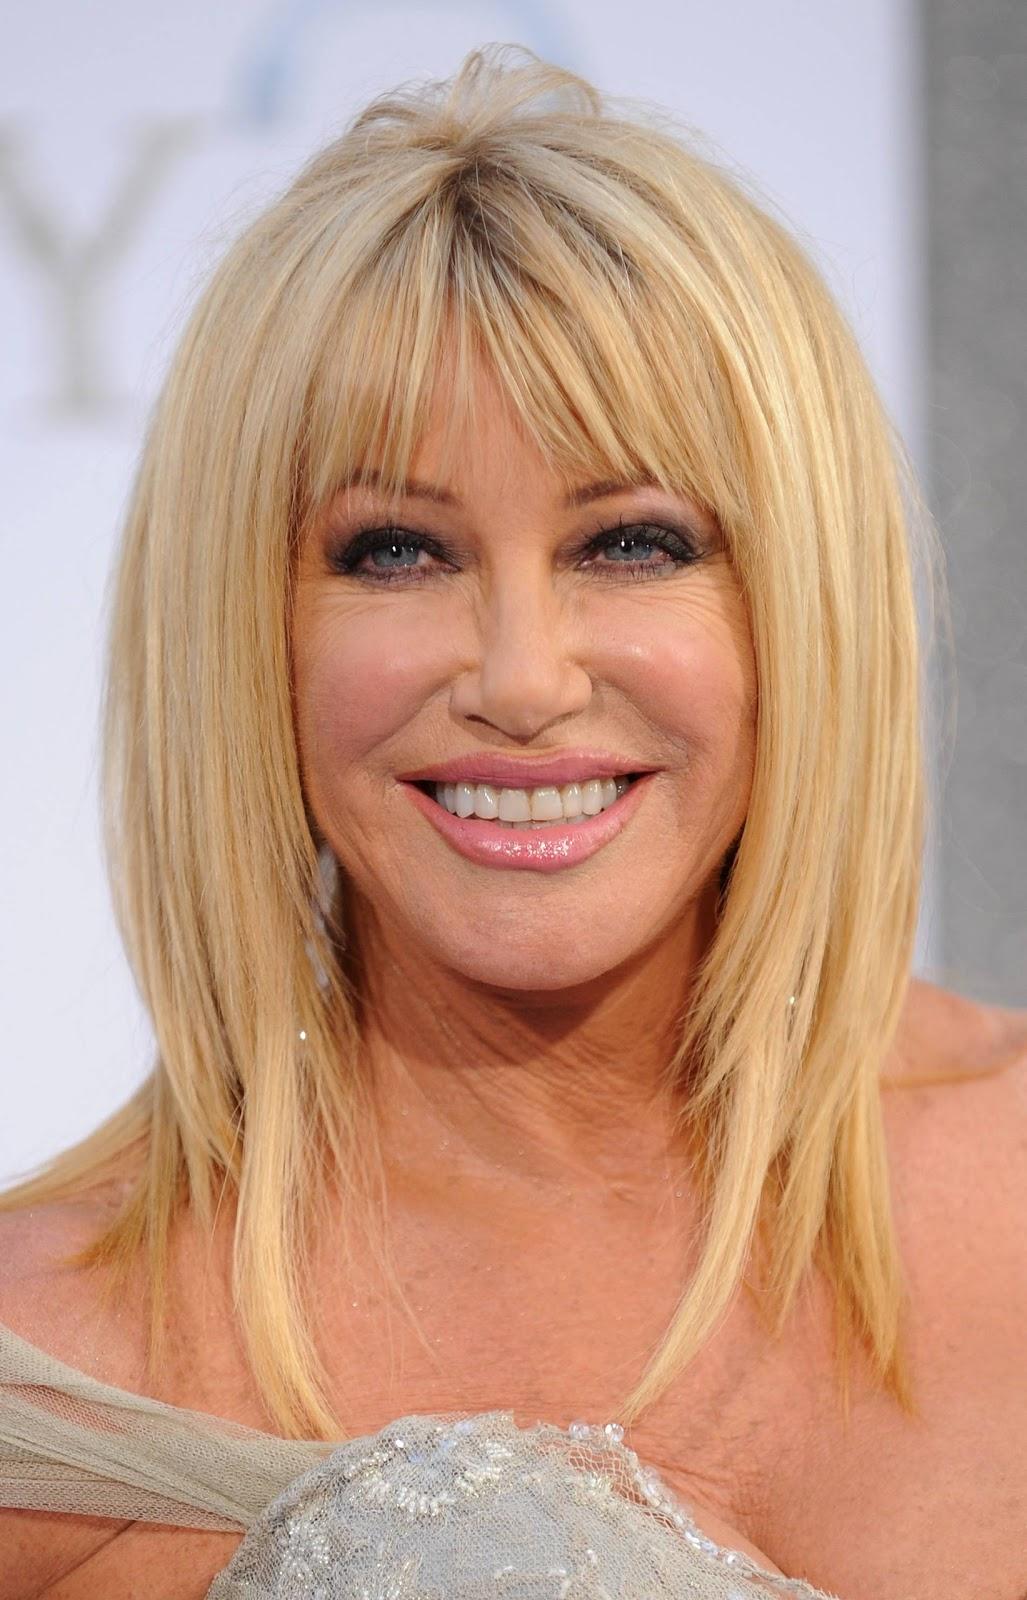 best celebrity hairstyles celebrity hairstyles 2020